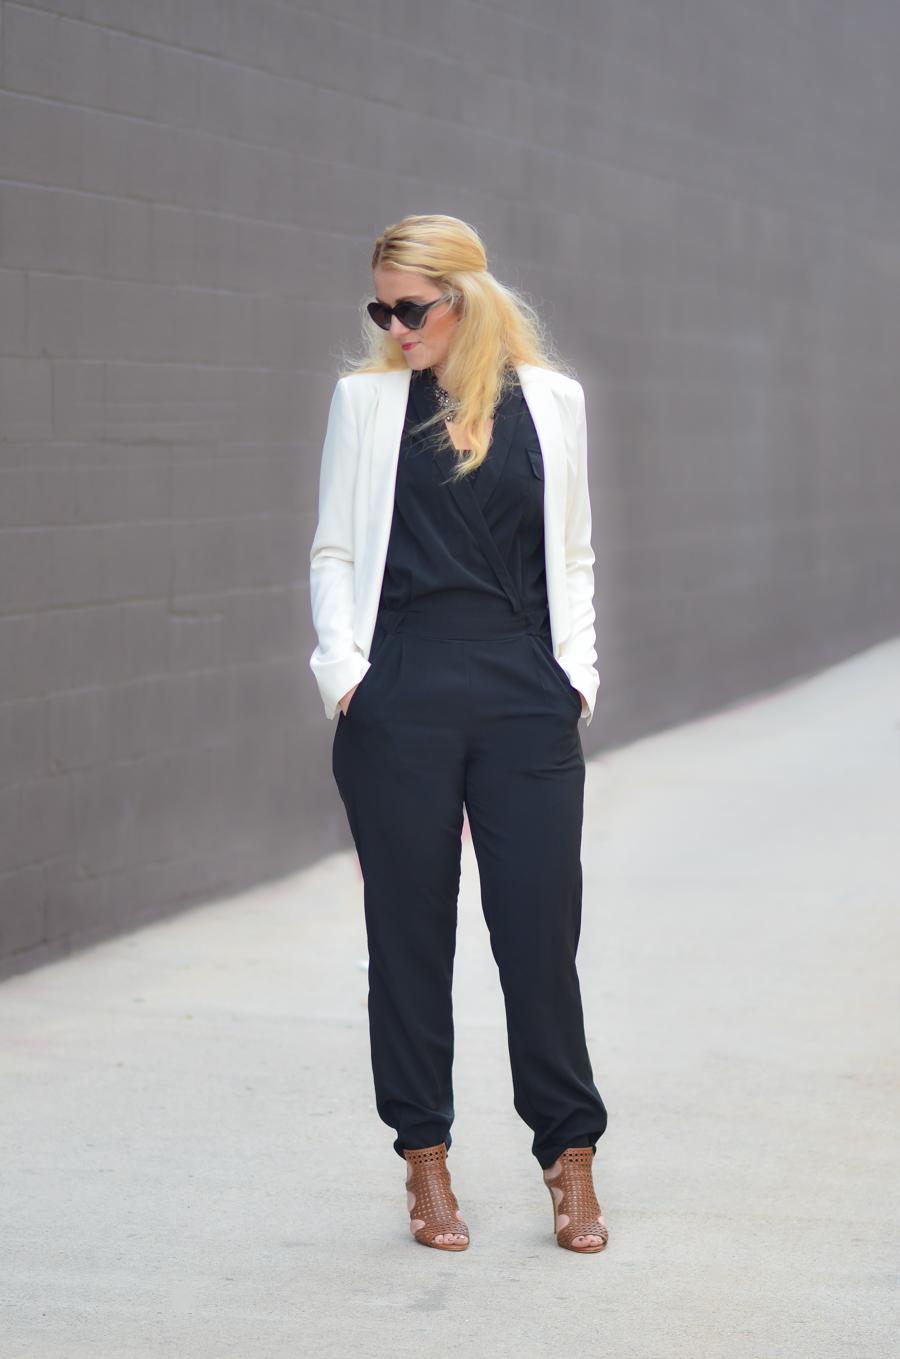 Late Summer + Fall 2016 Trends   Black Pantsuit   Nordstrom Anniversary Sale Picks   Luci's Morsels :: LA Women's Fashion Blog